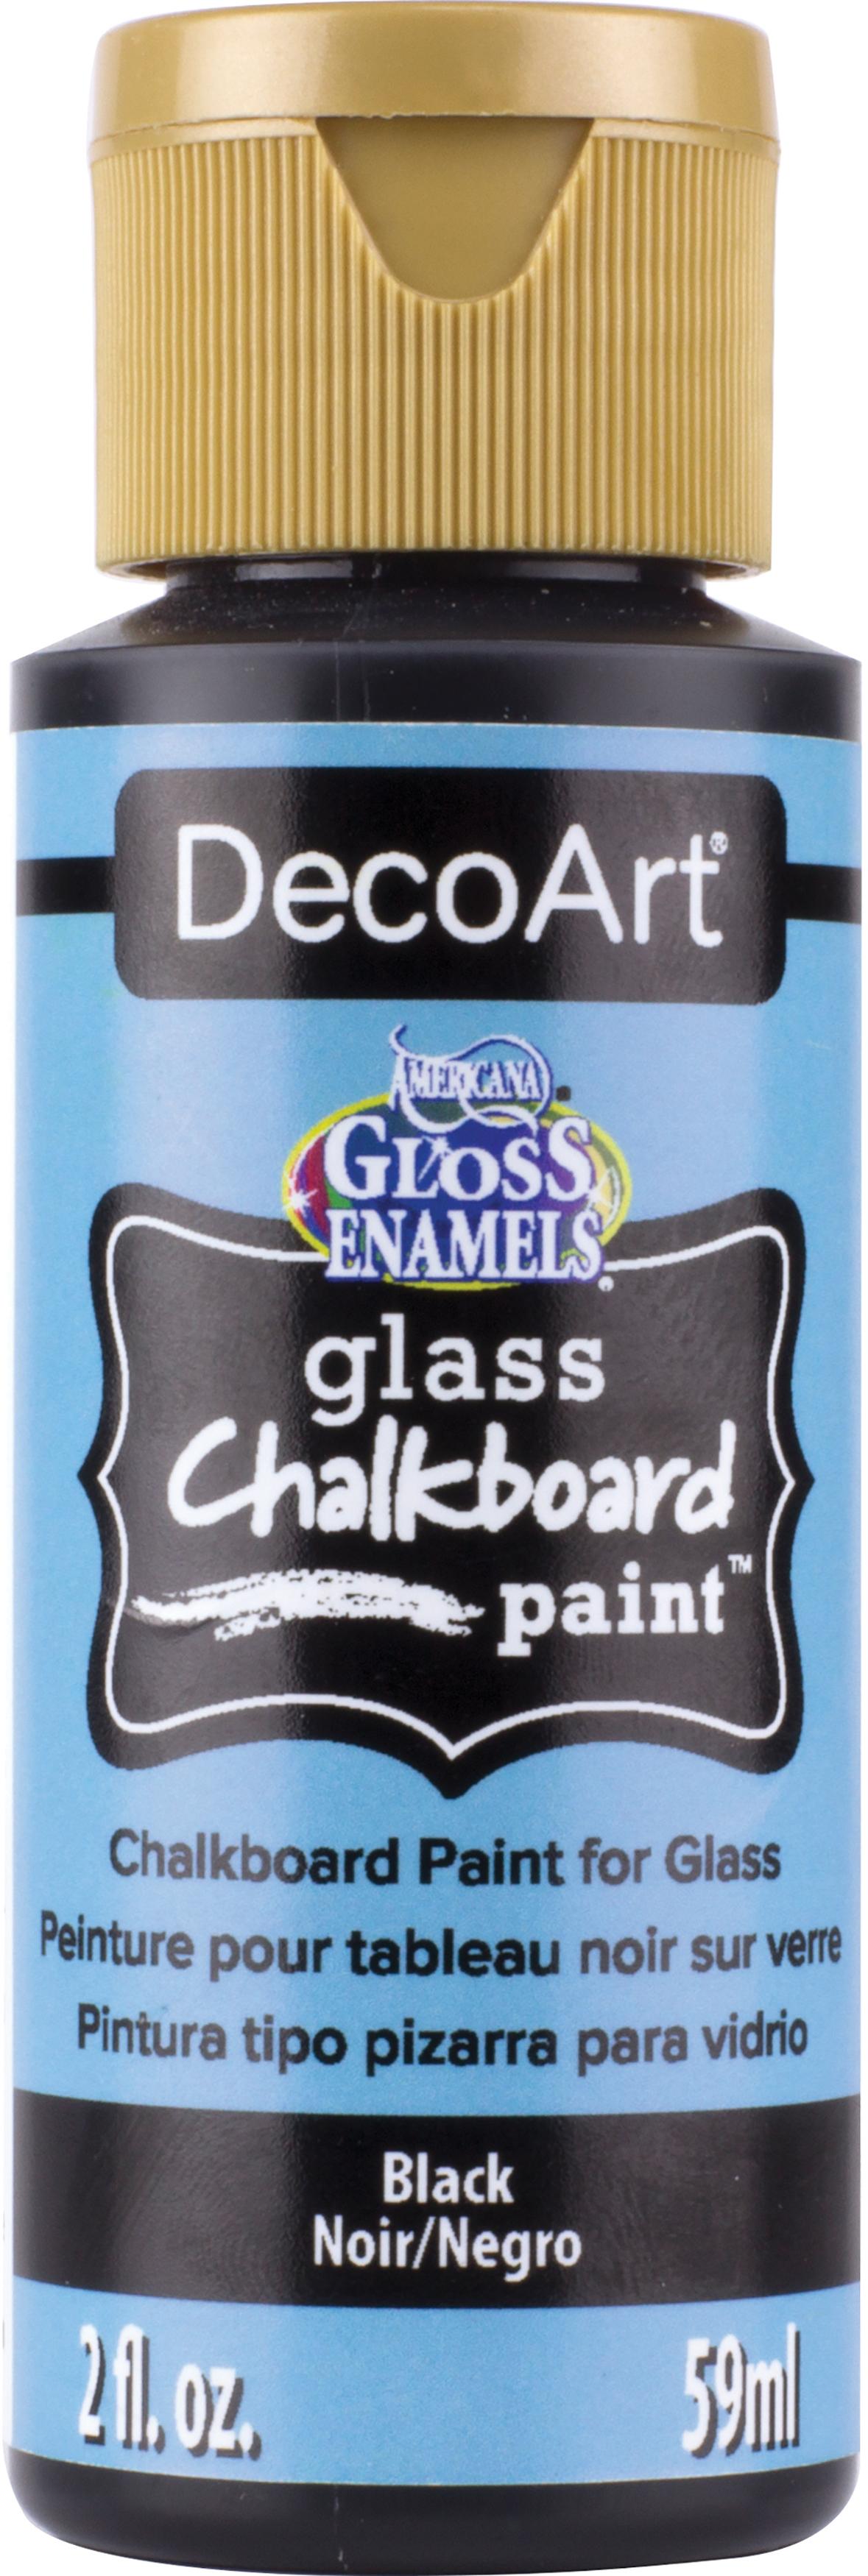 Americana Gloss Enamels Glass Chalkboard Paint 2oz-Black